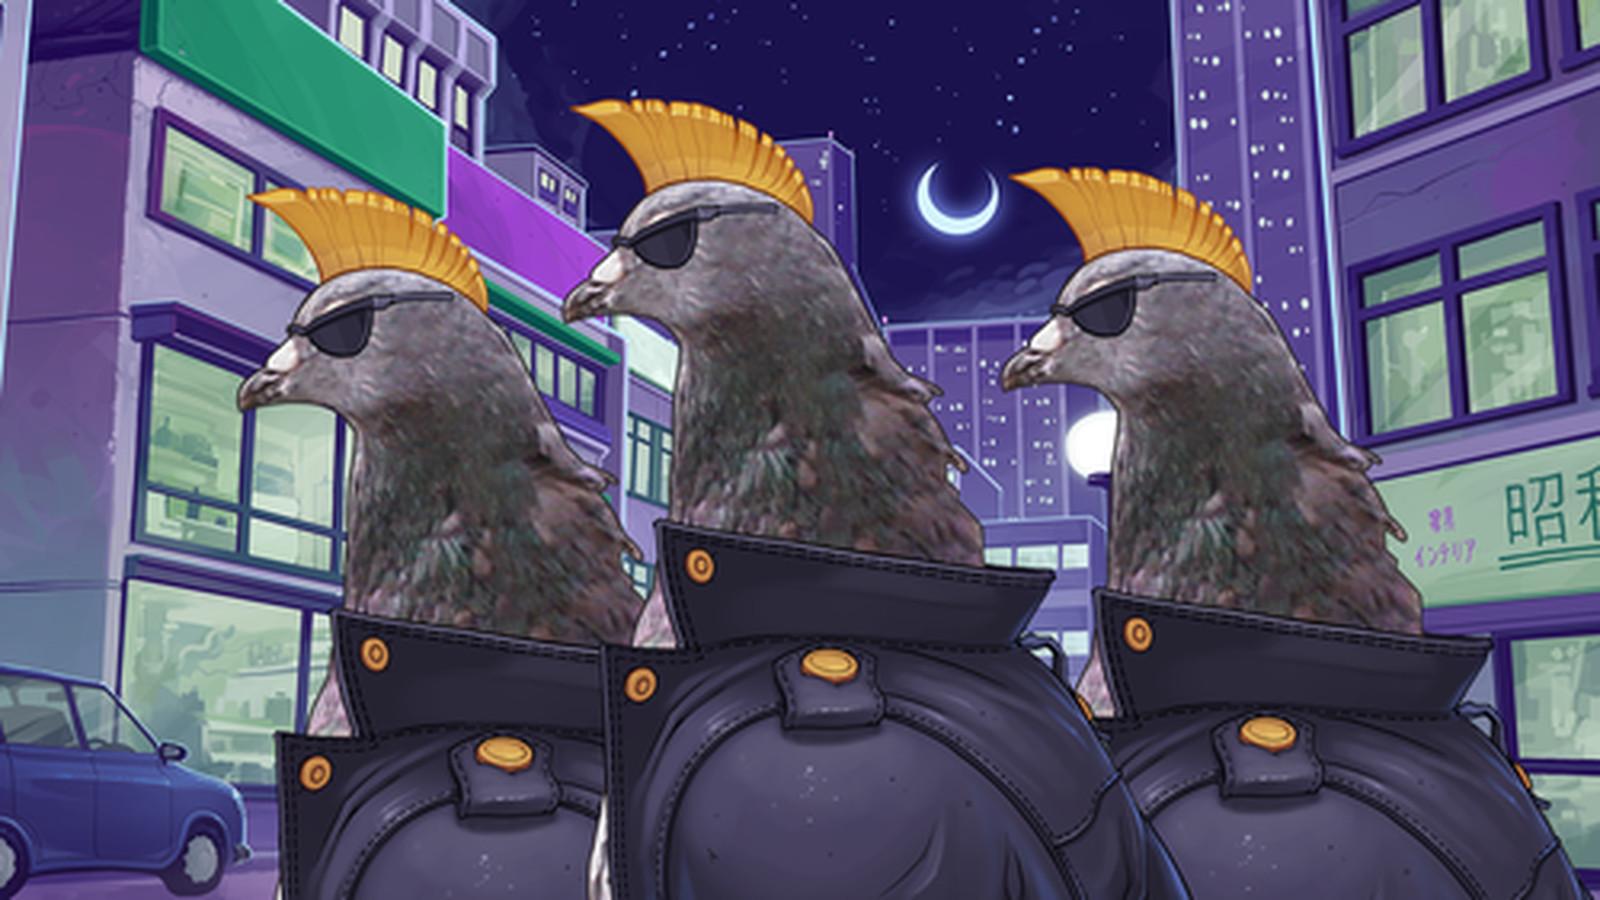 Pigeon dating sim hatoful boyfriend delayed to sept 4 polygon